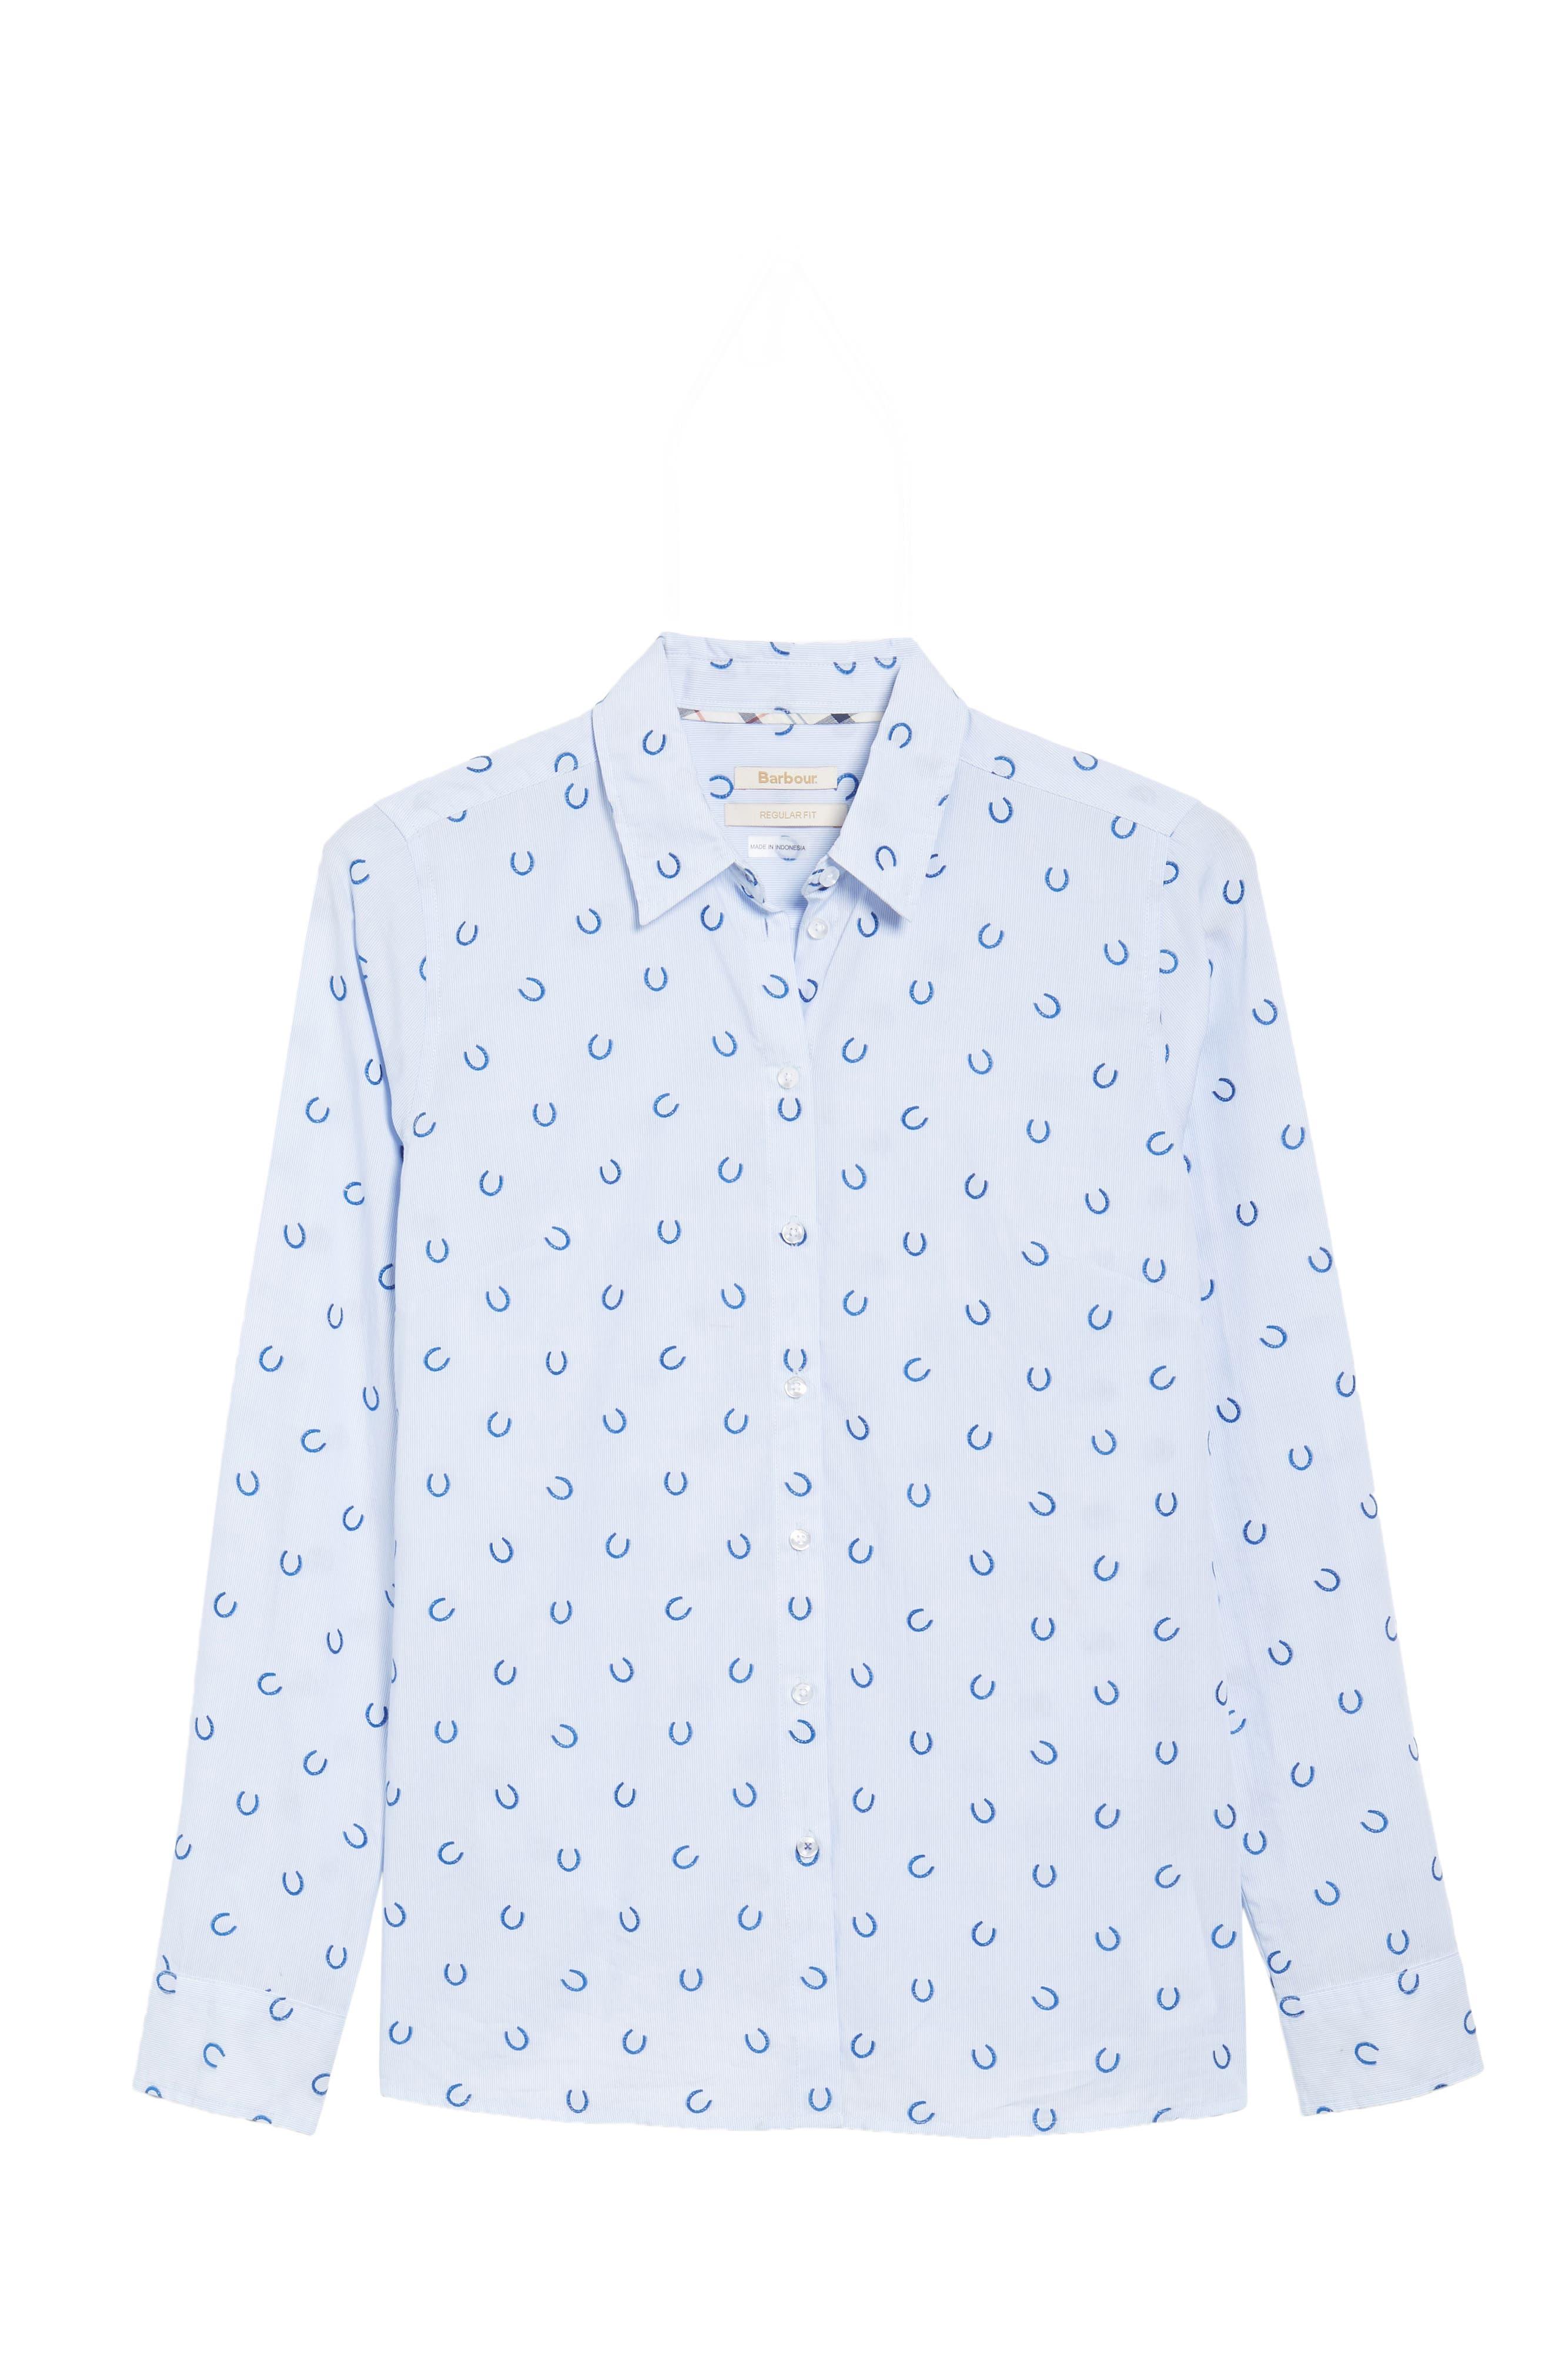 Daisyhill Regular Fit Shirt,                             Alternate thumbnail 6, color,                             Pale Blue